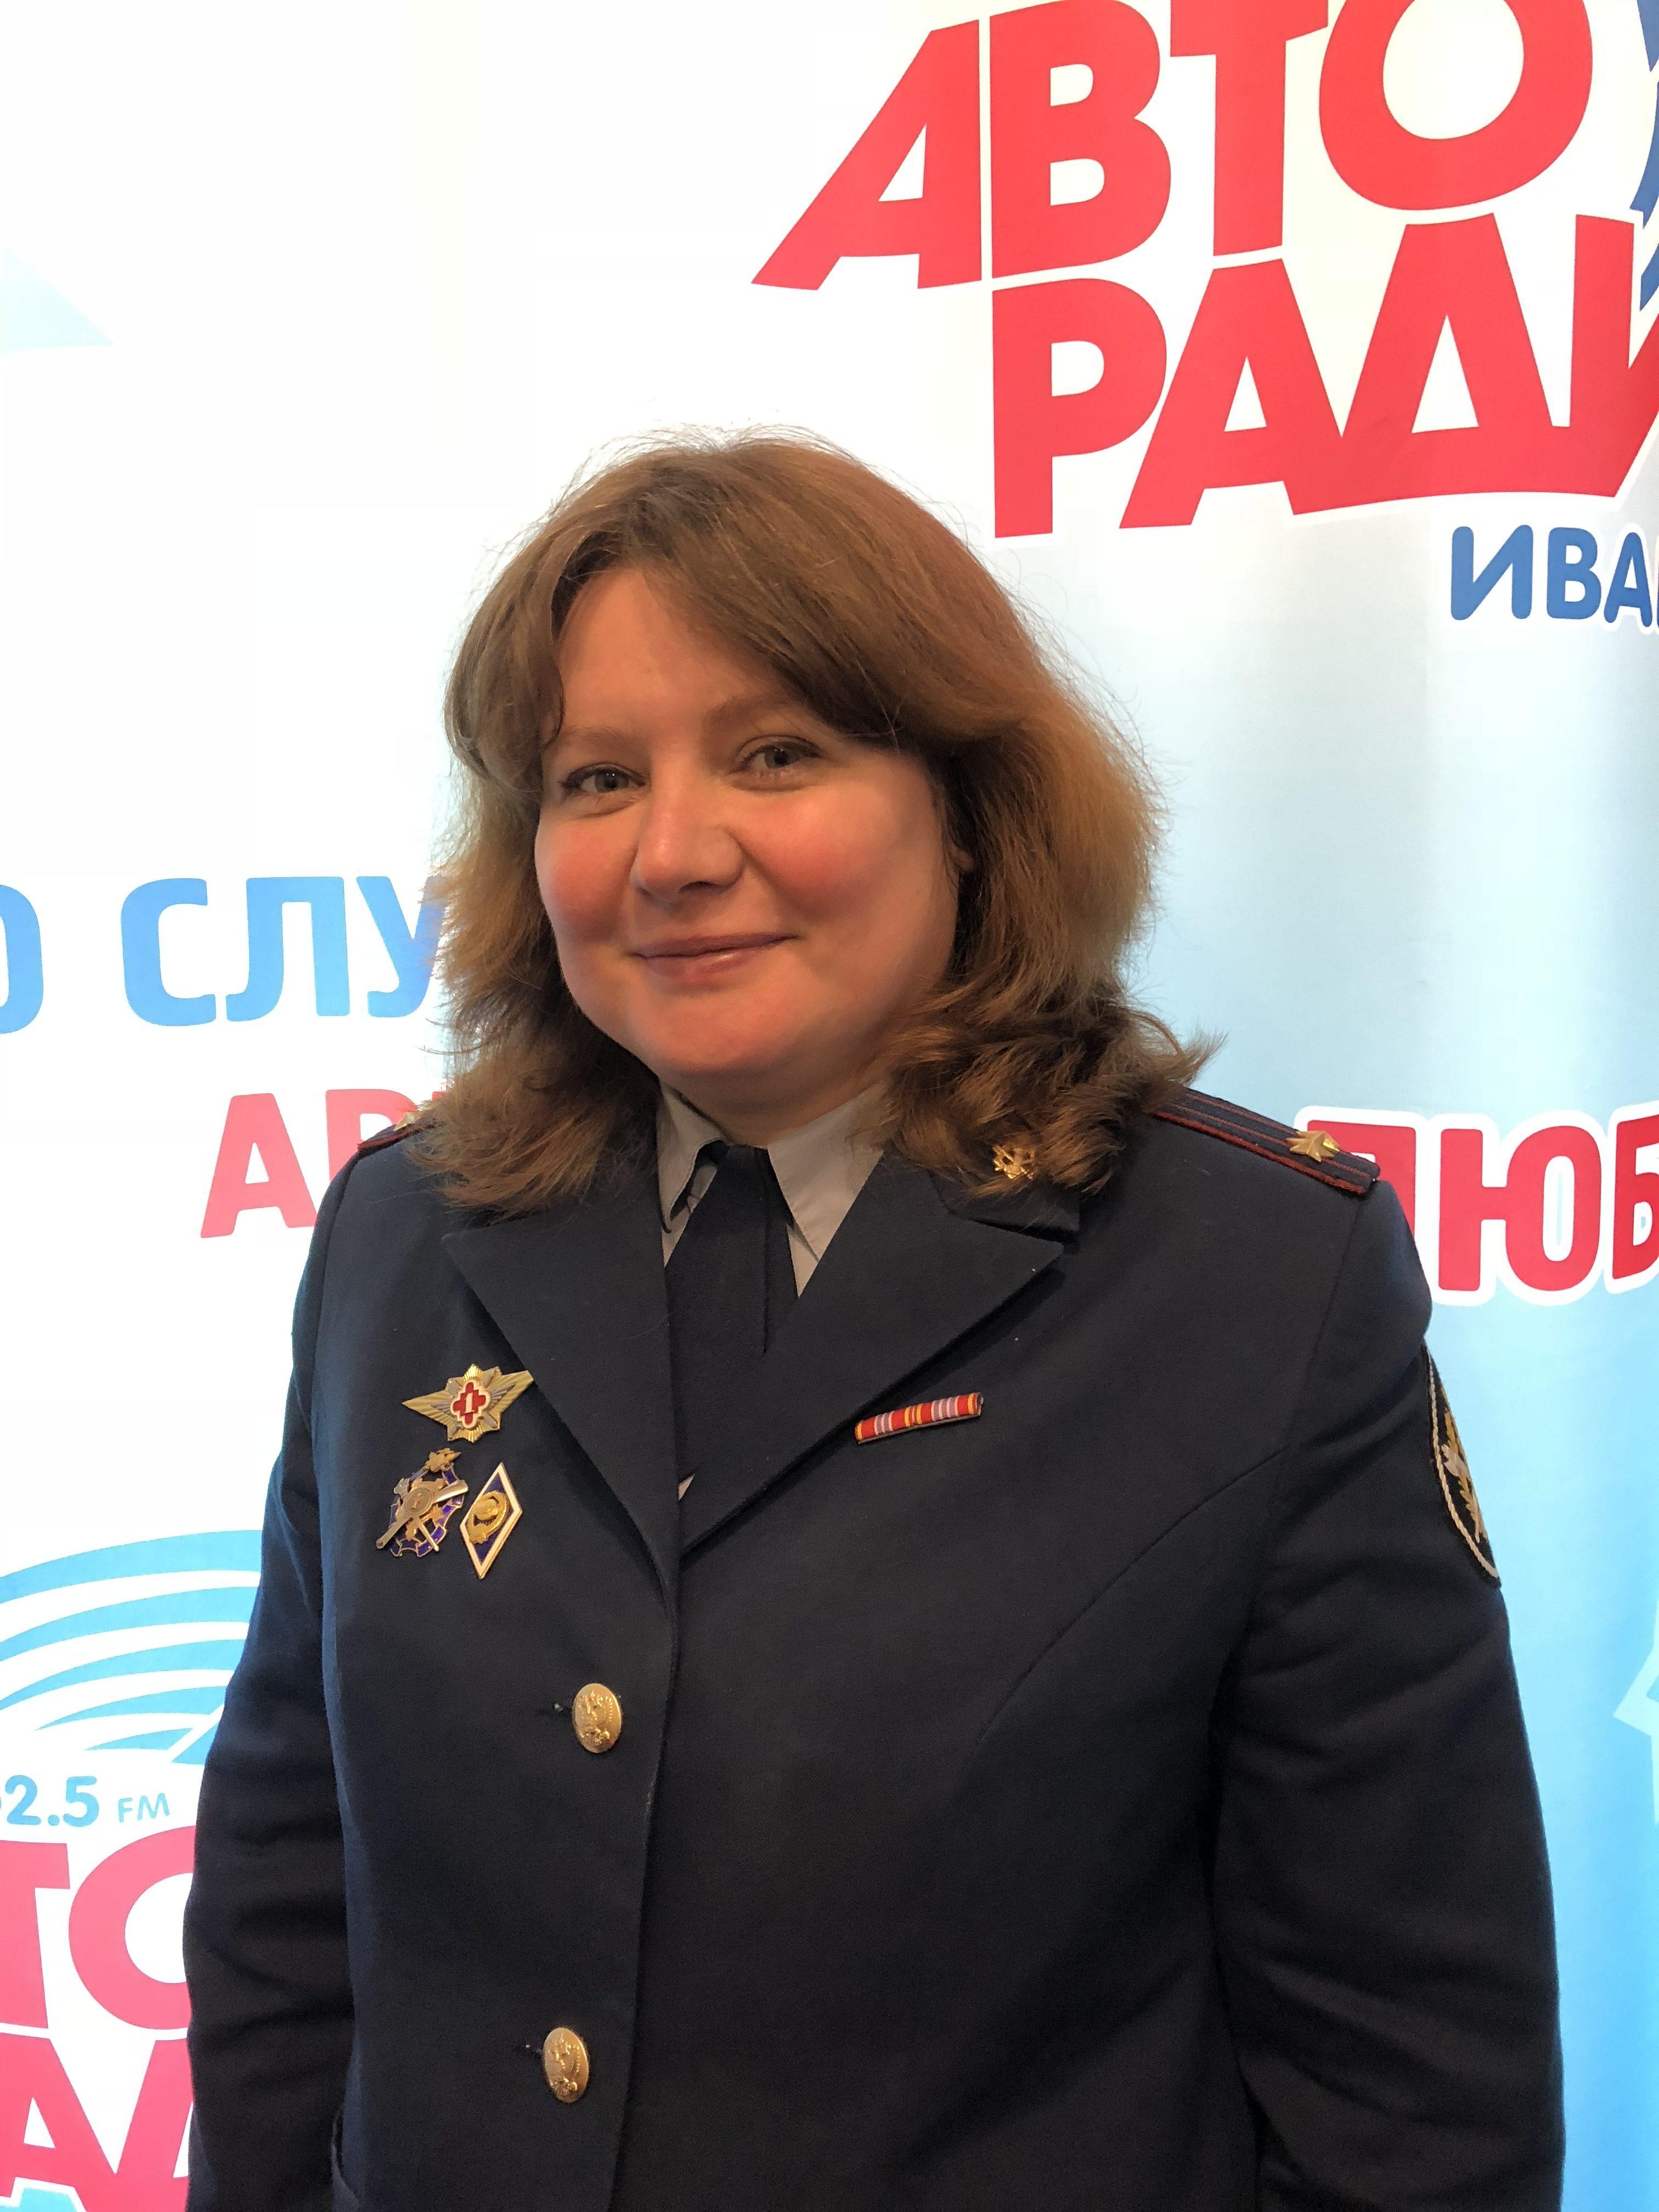 lampasova-ufsin-100518-ar